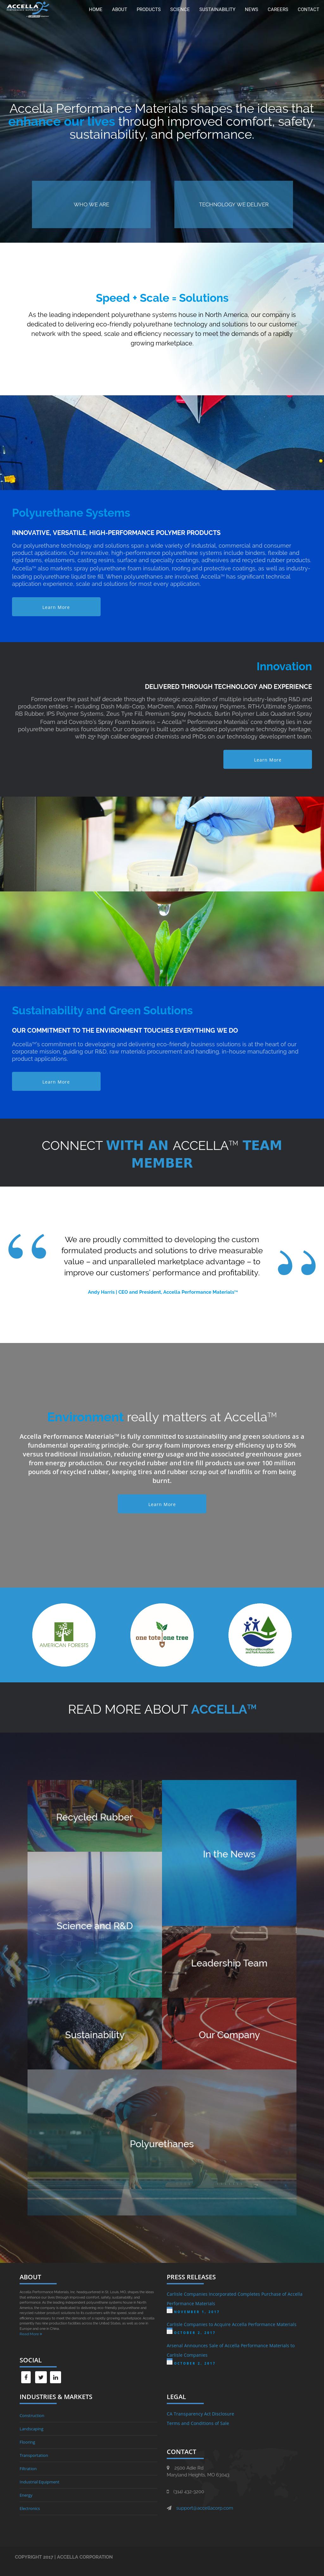 Accella Performance Materials Competitors, Revenue and